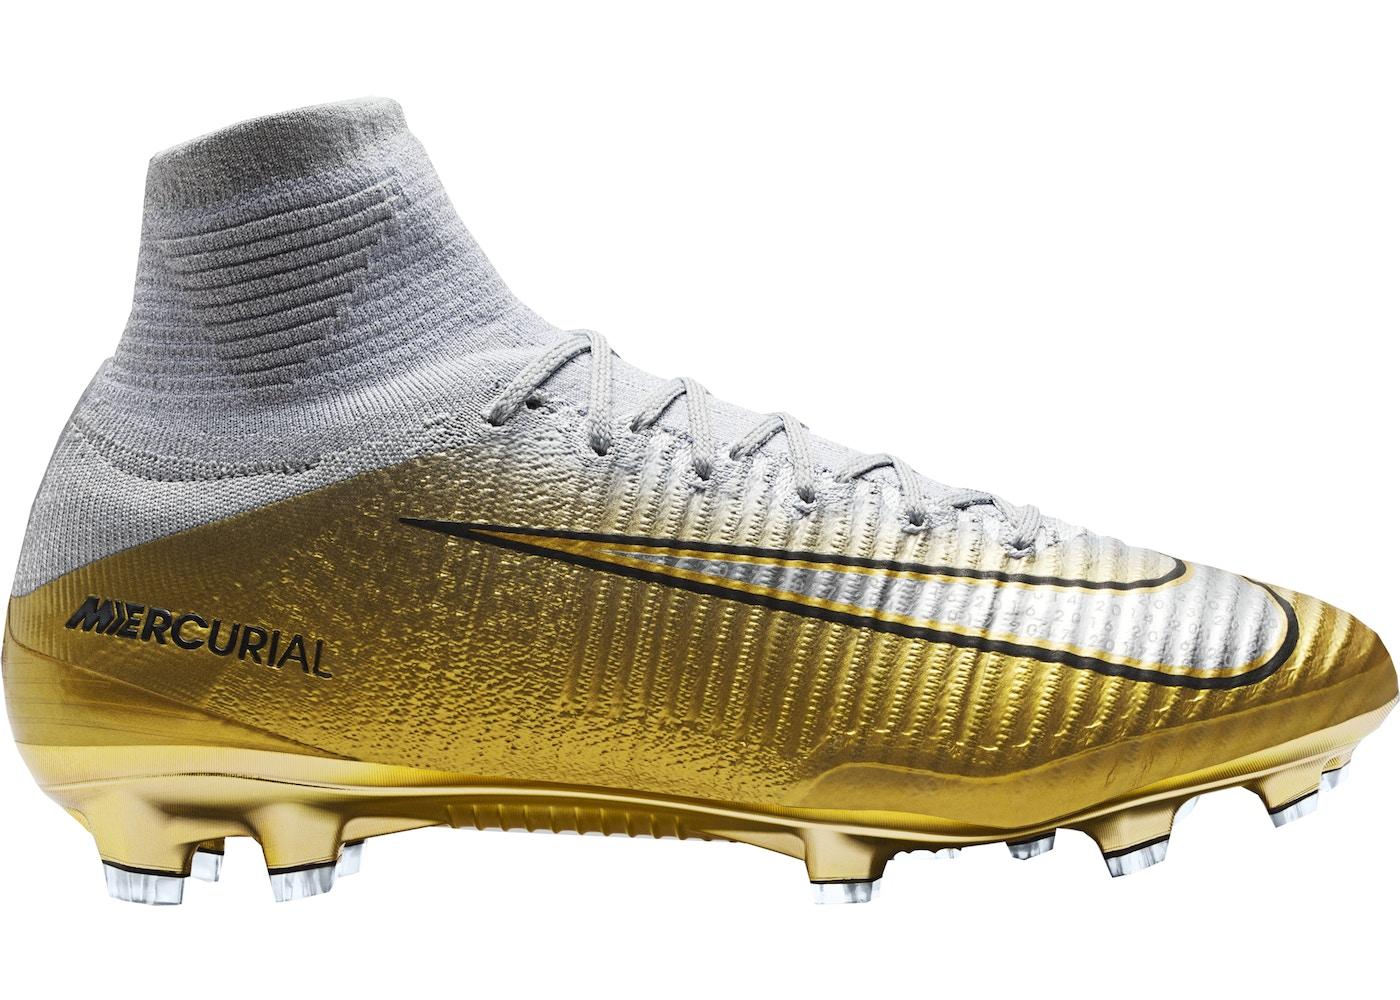 low priced fe1ab 641ba Nike Mercurial Superfly CR7 Cristiano Ronaldo Quinto Triunfo